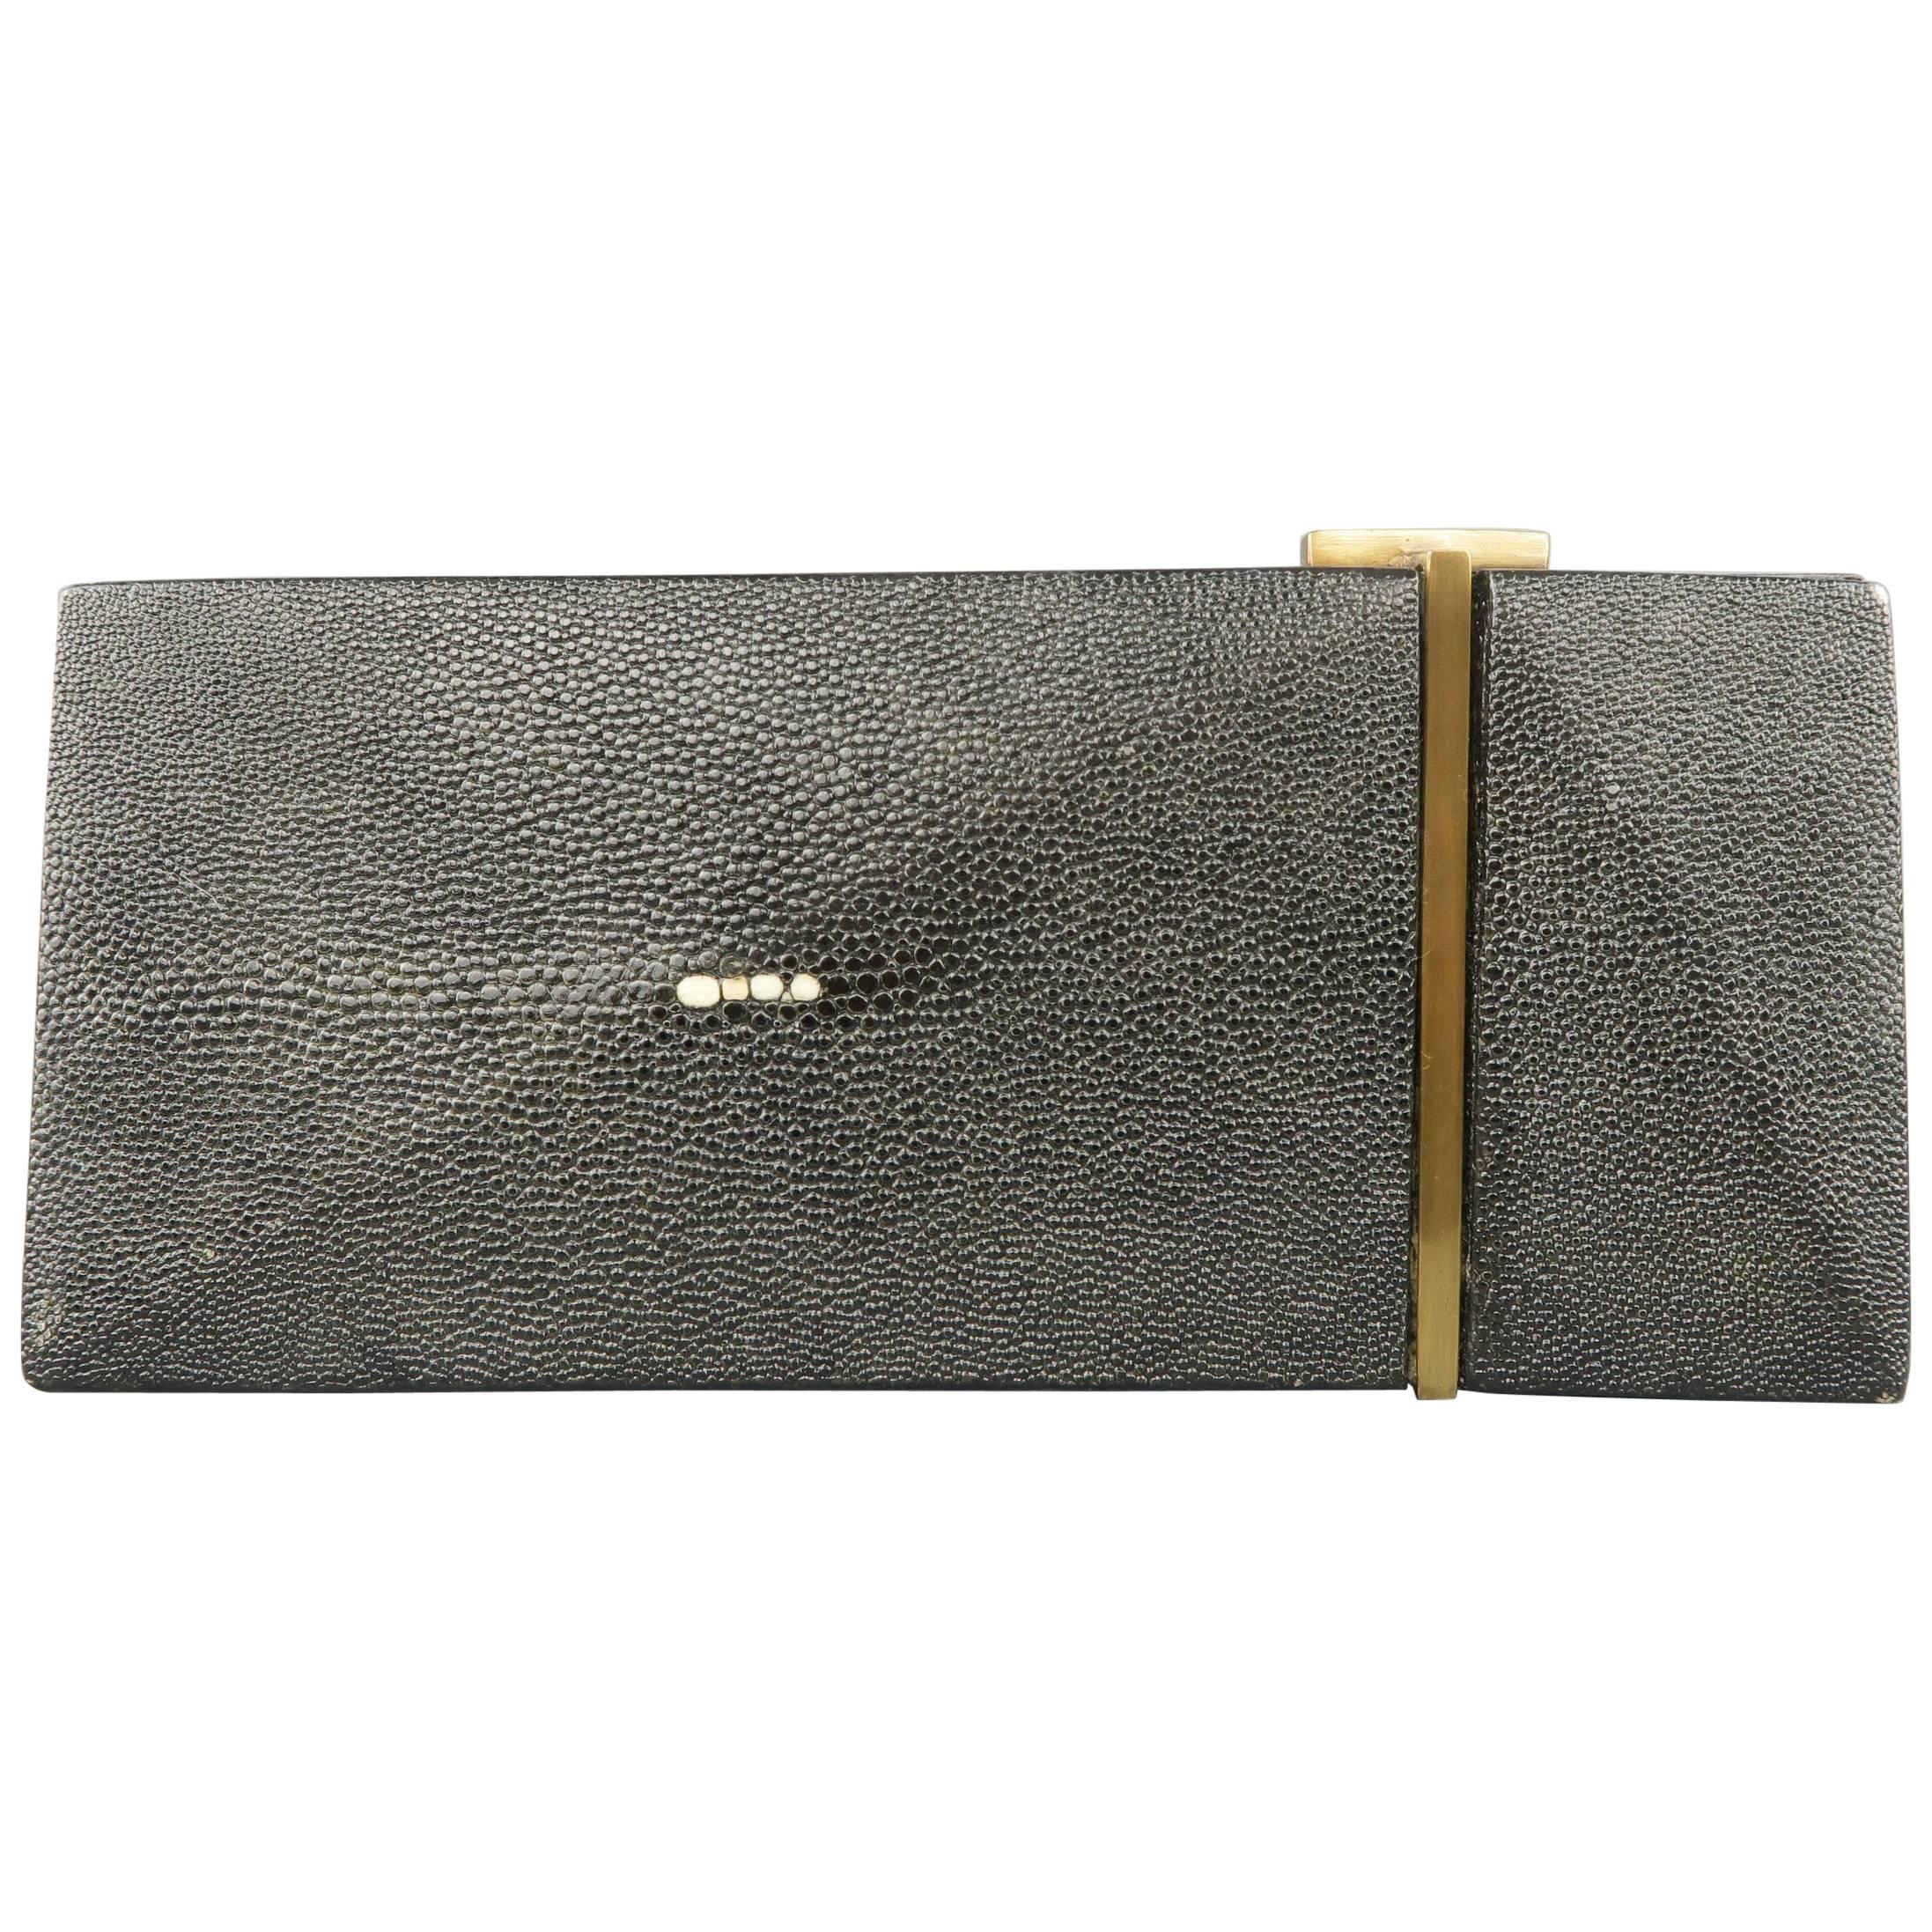 1stdibs R&y Augousti Black Stingray Leather Geometric Clutch Handbag JUDEzKOFM